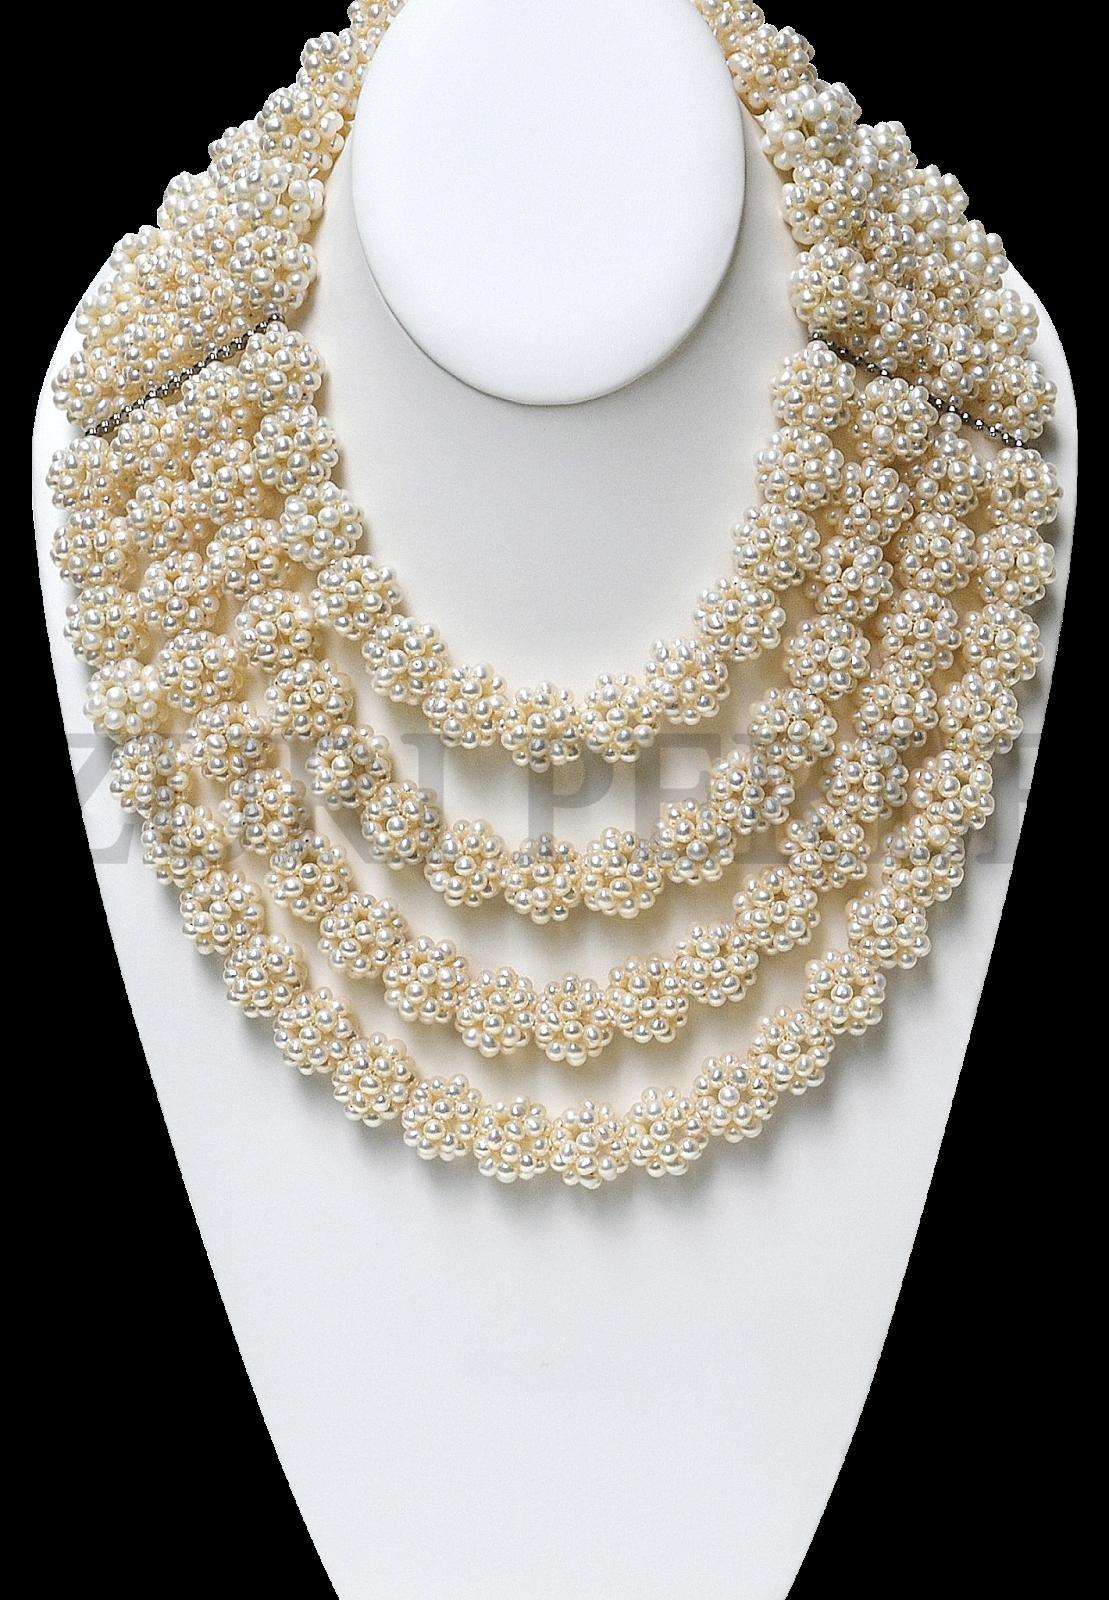 white fresh water cluster pearls Zuri Perle necklace earrings bracelet